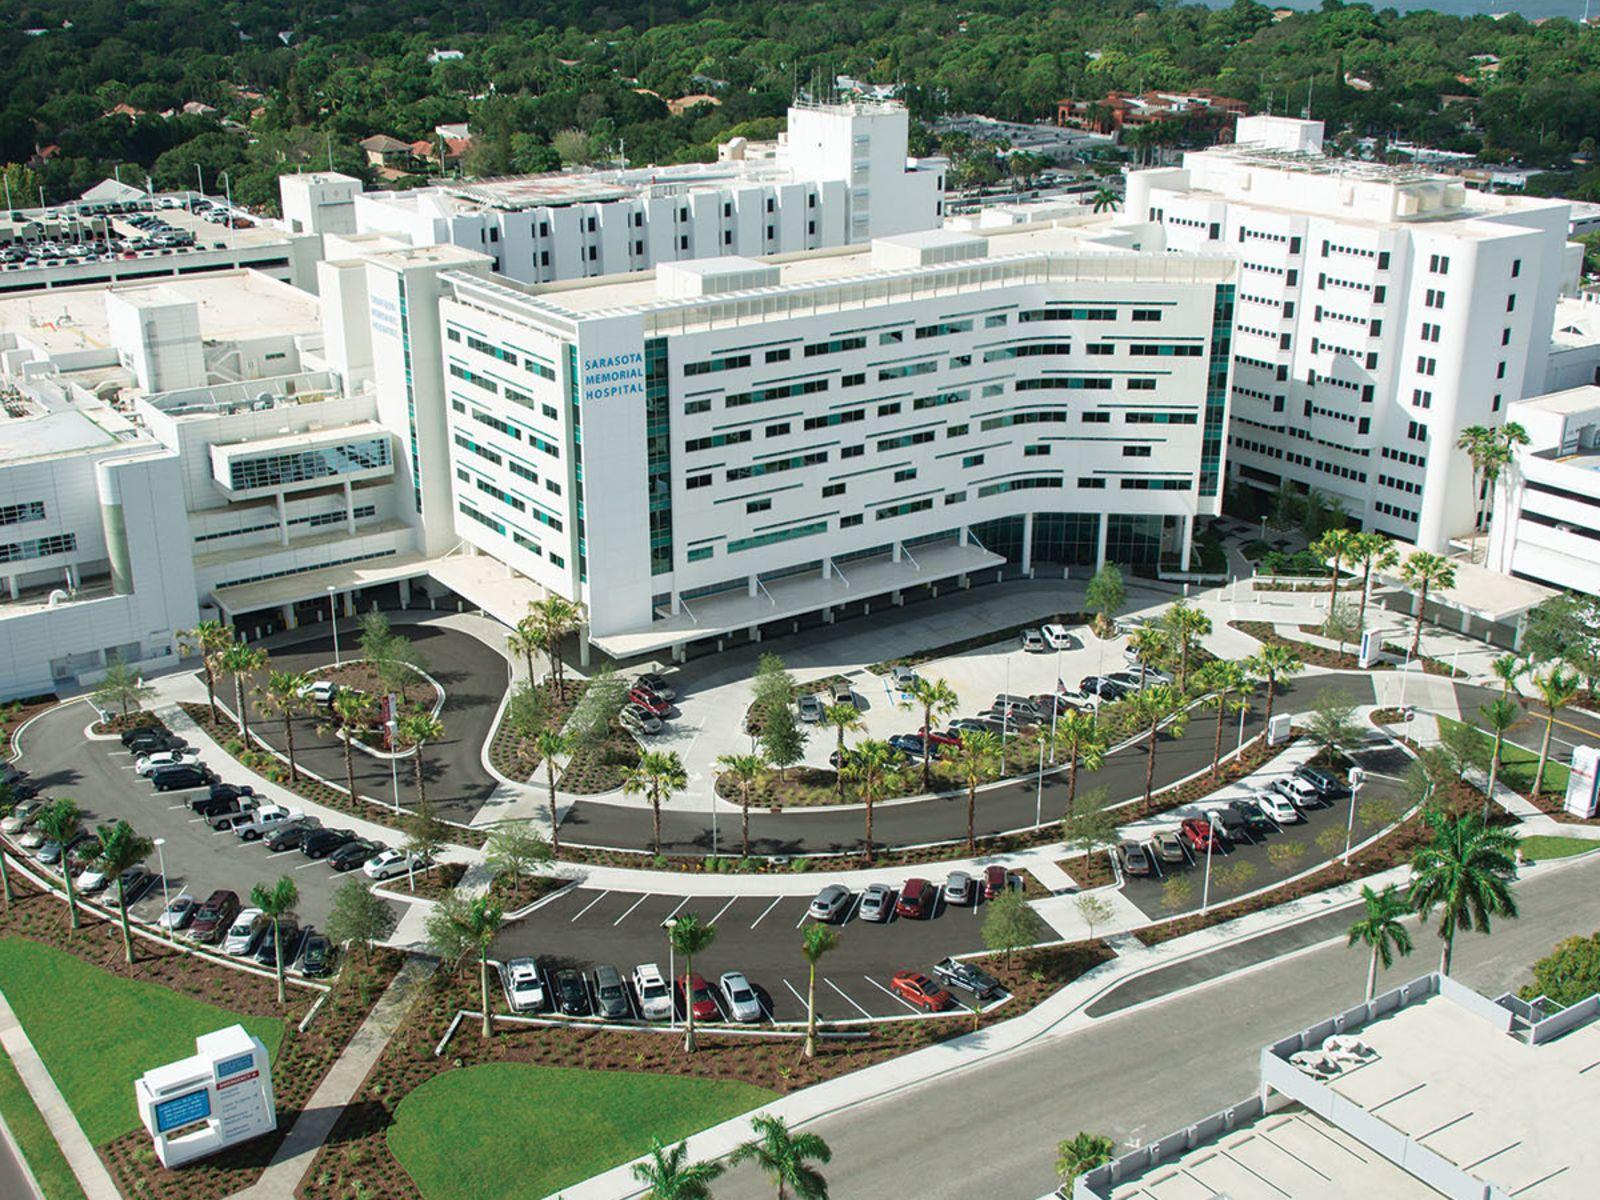 Sarasota memorial hospital wzox2z